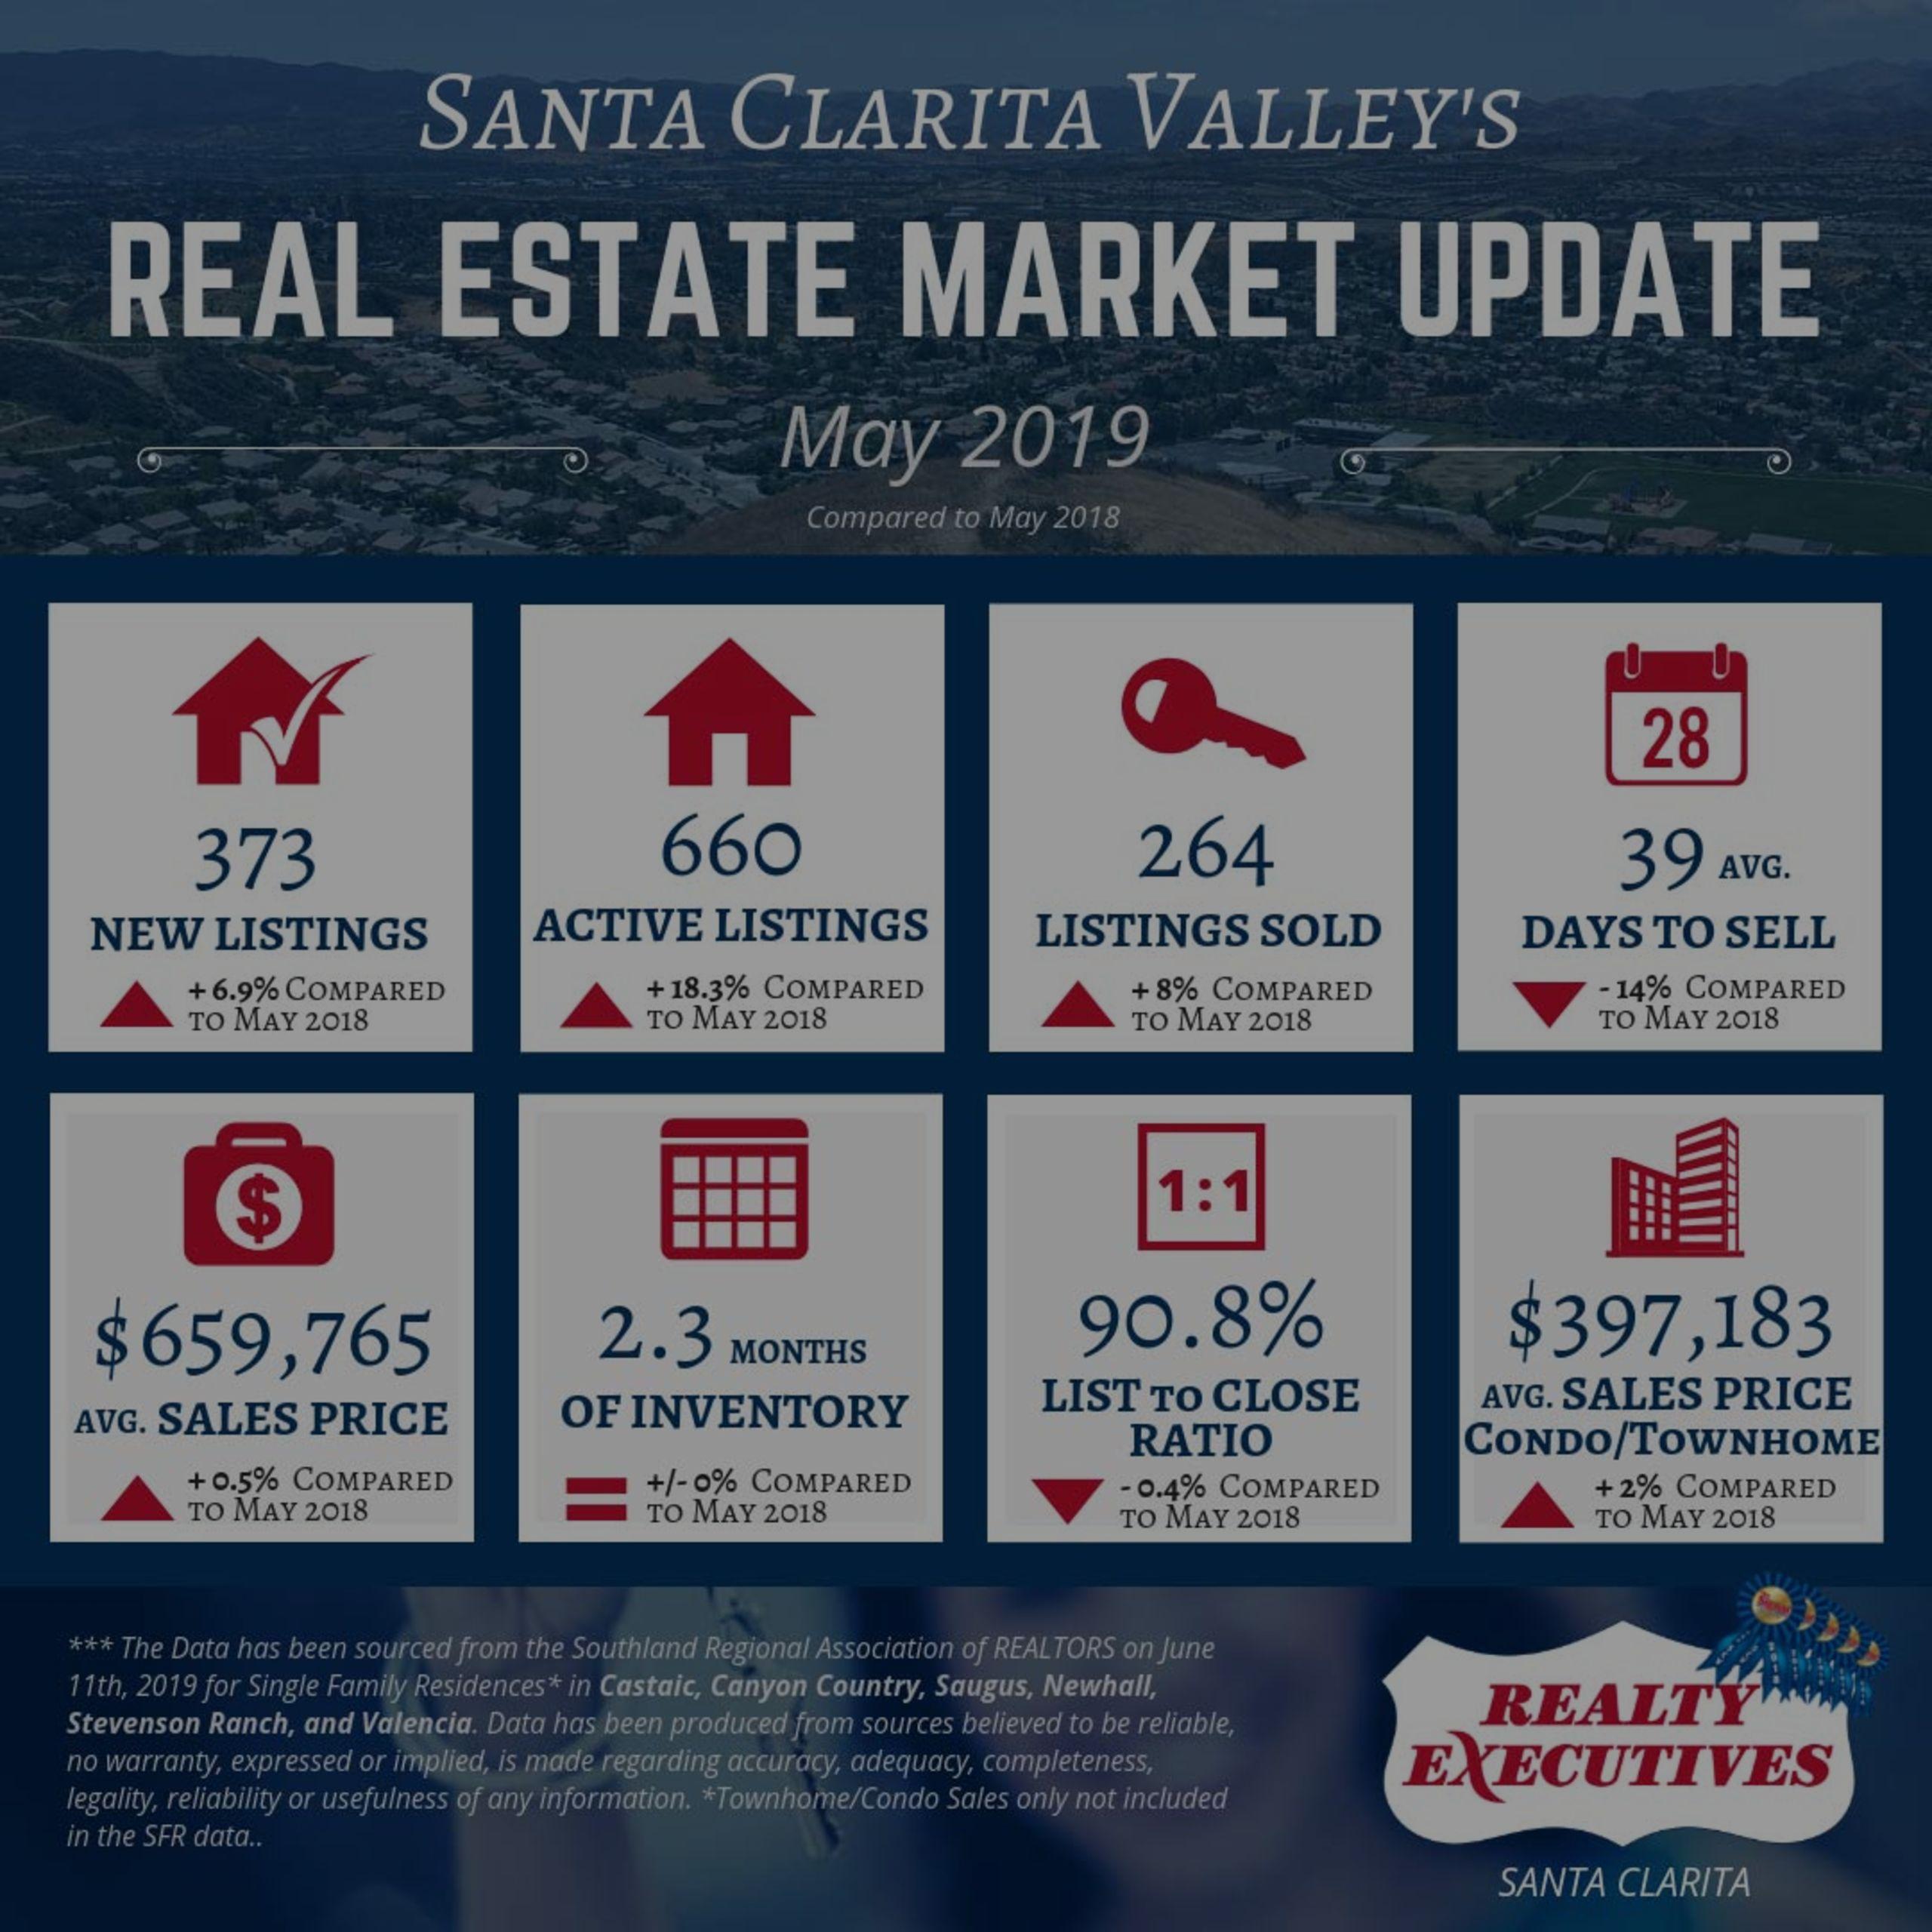 May 2019: Santa Clarita Valley Real Estate Market Update